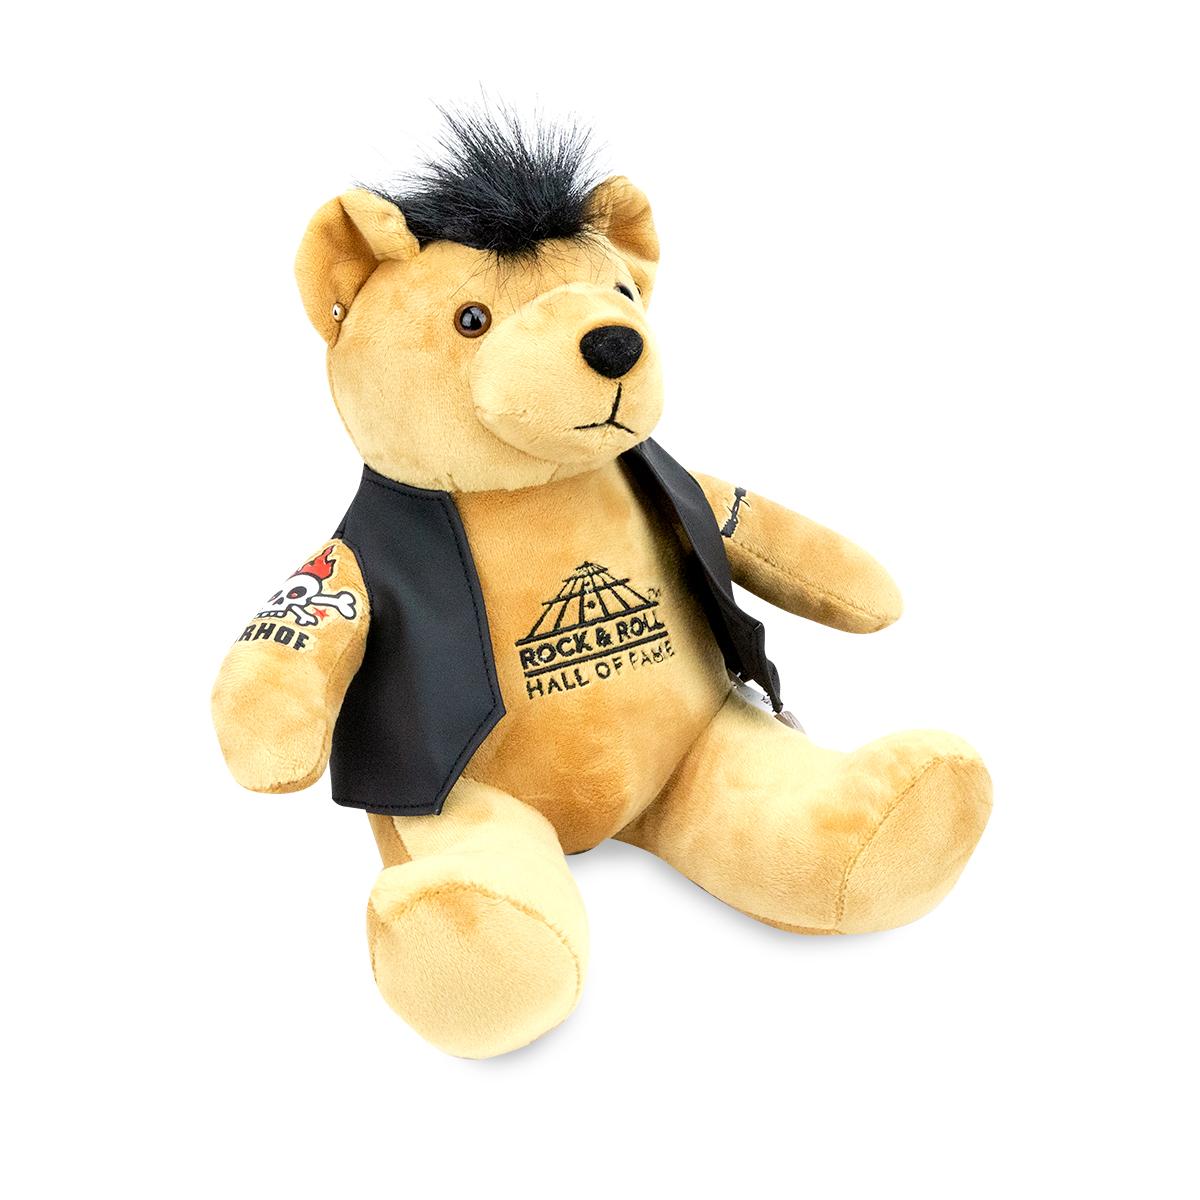 Rockin' Teddy Bear